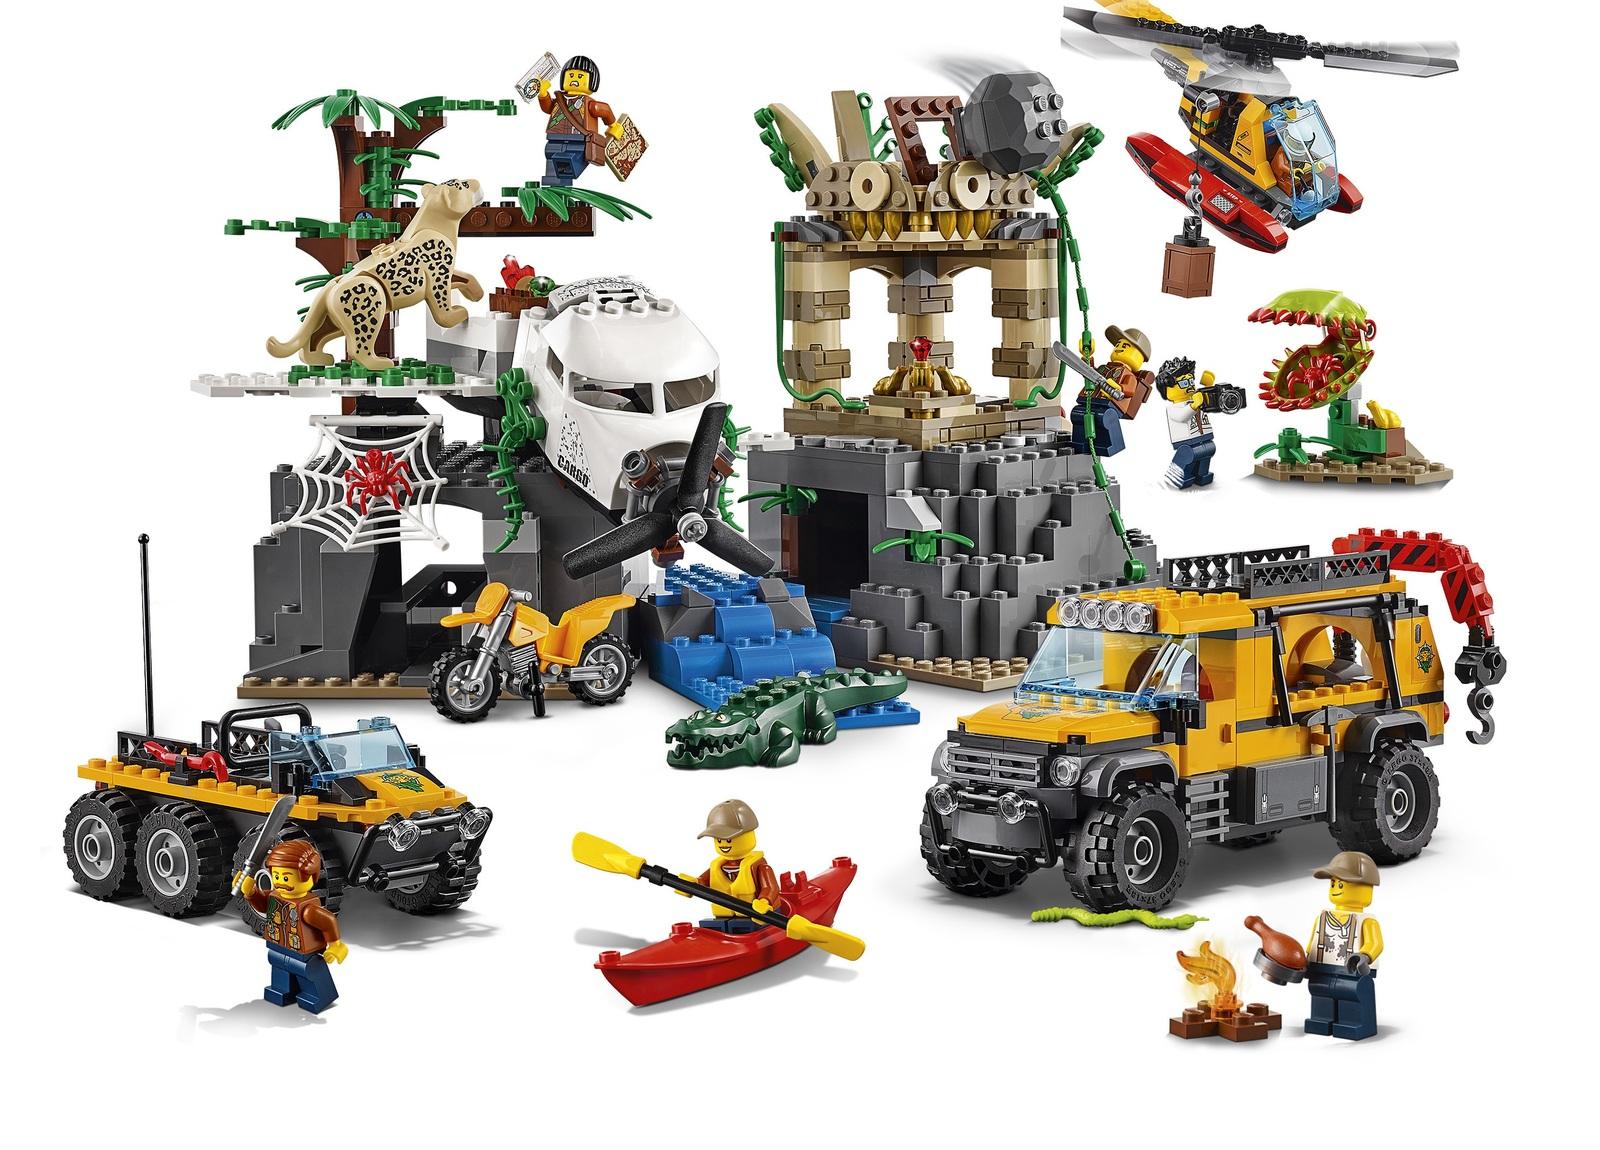 LEGO City: Jungle Exploration Site (60161) image